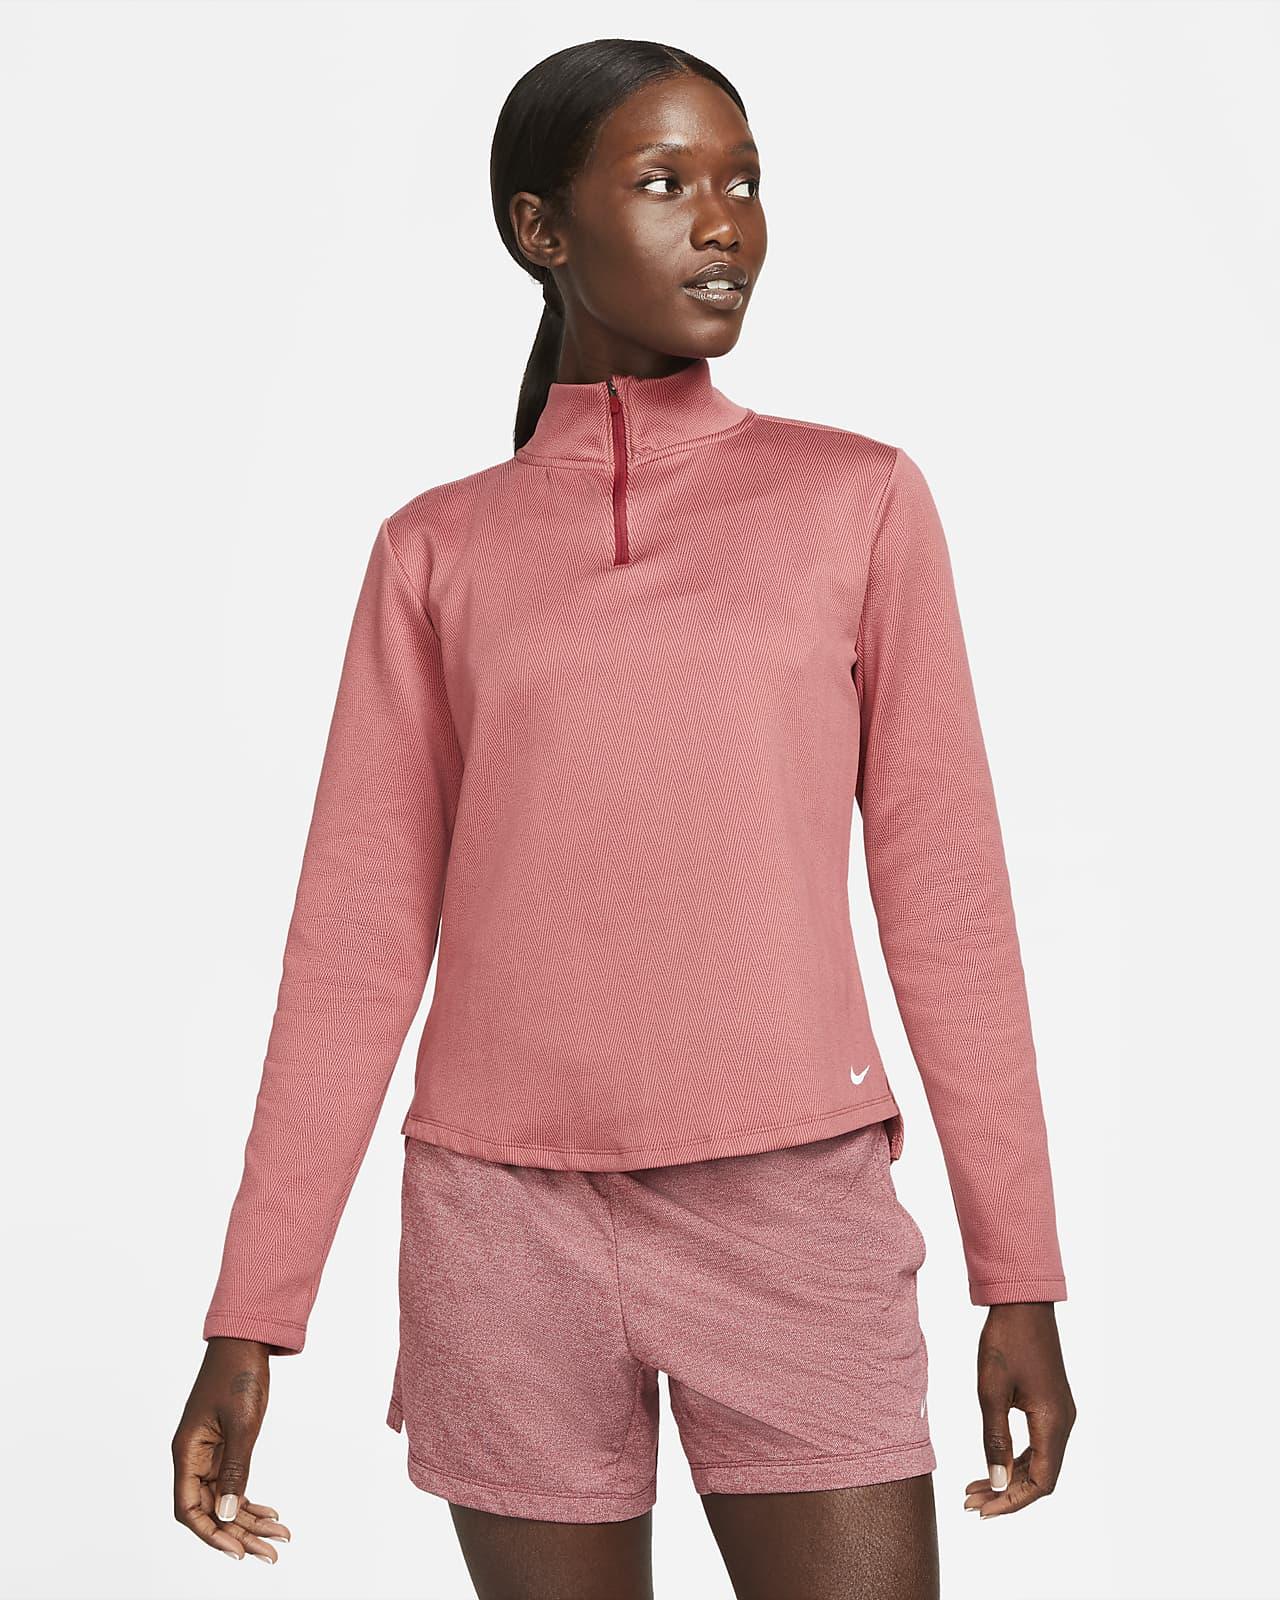 Nike Therma-FIT One Women's Long-Sleeve 1/2-Zip Top